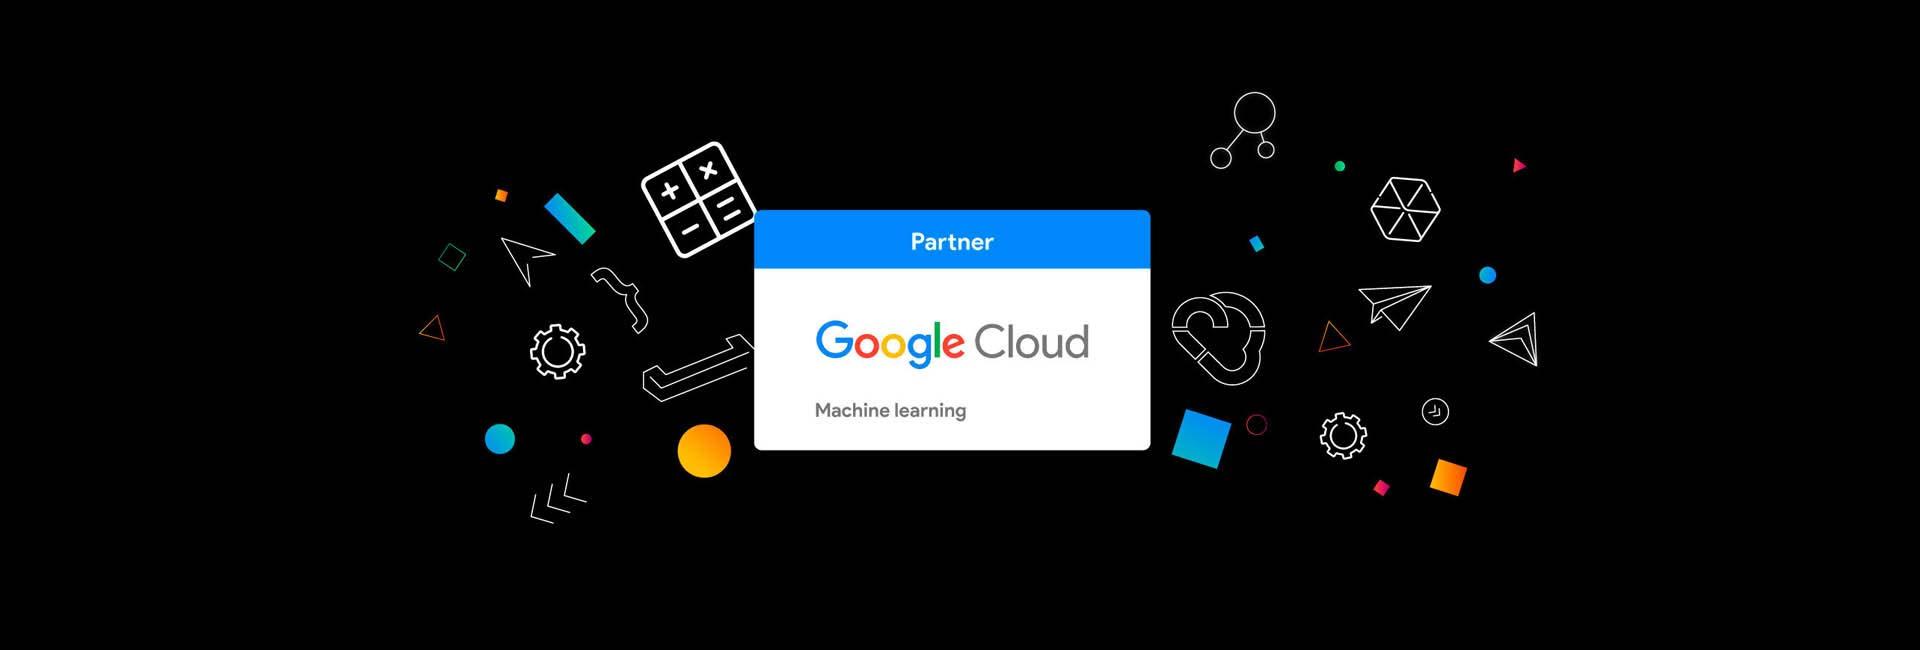 grupodot certificado machine learning